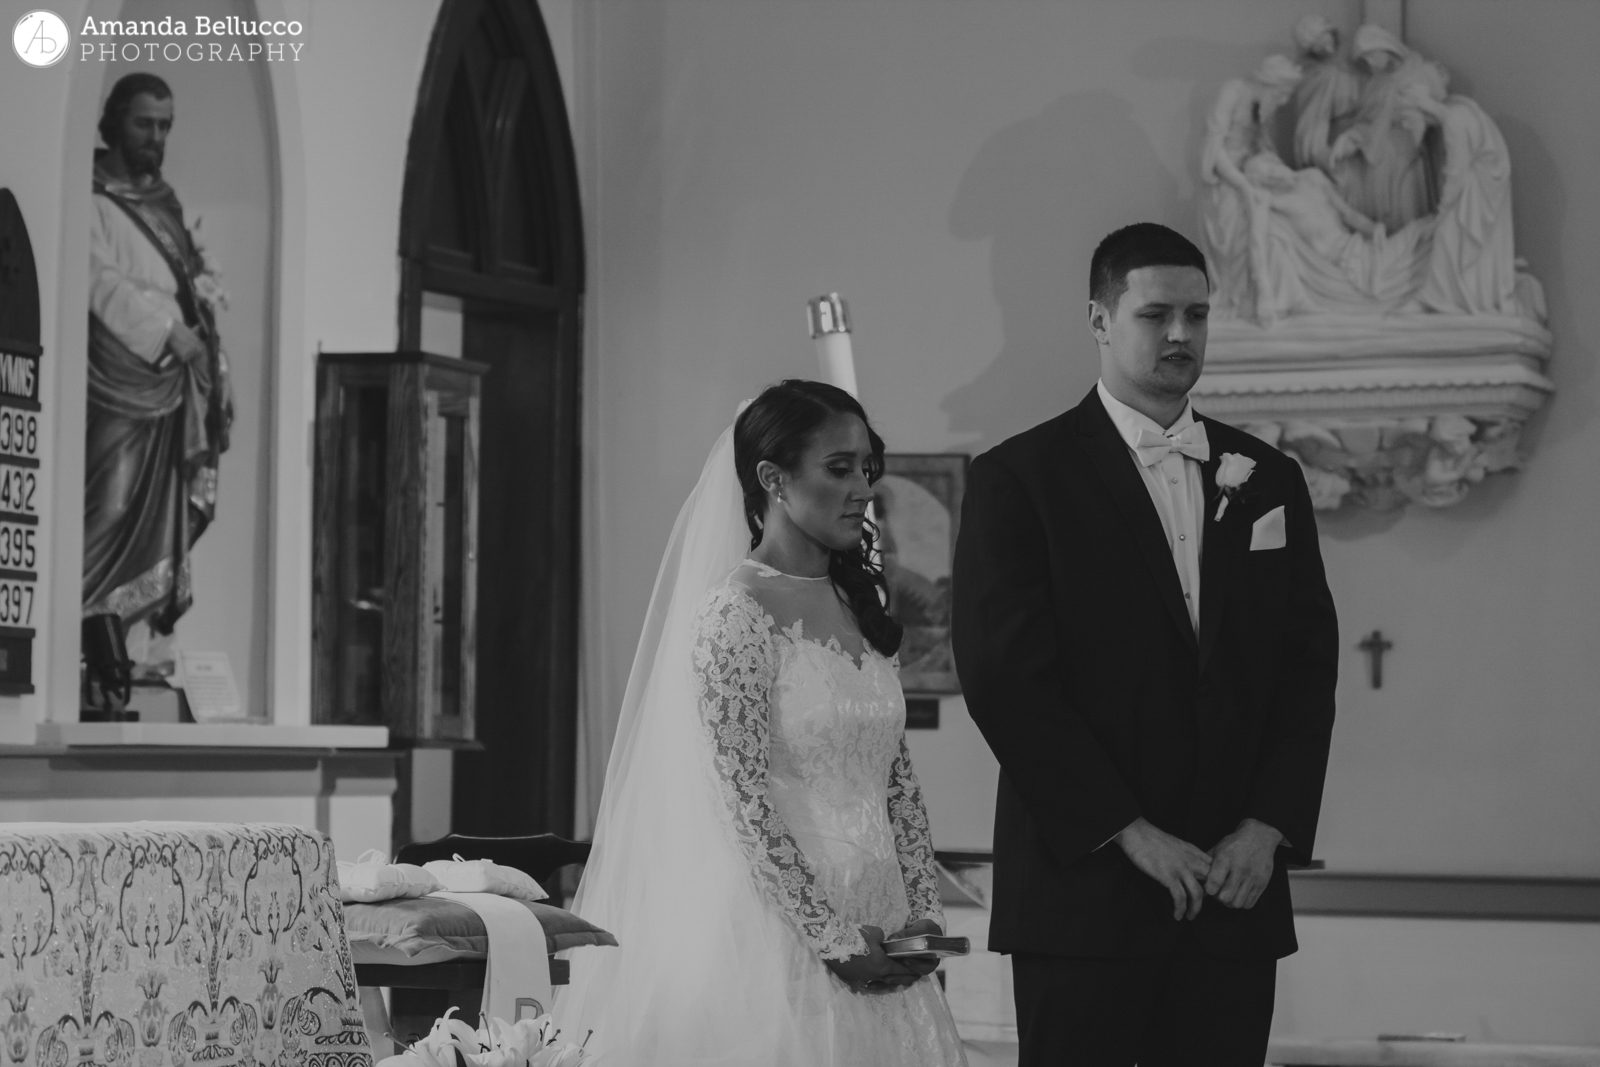 syracuse-rochester-fine-art-wedding-photographer-34.JPG